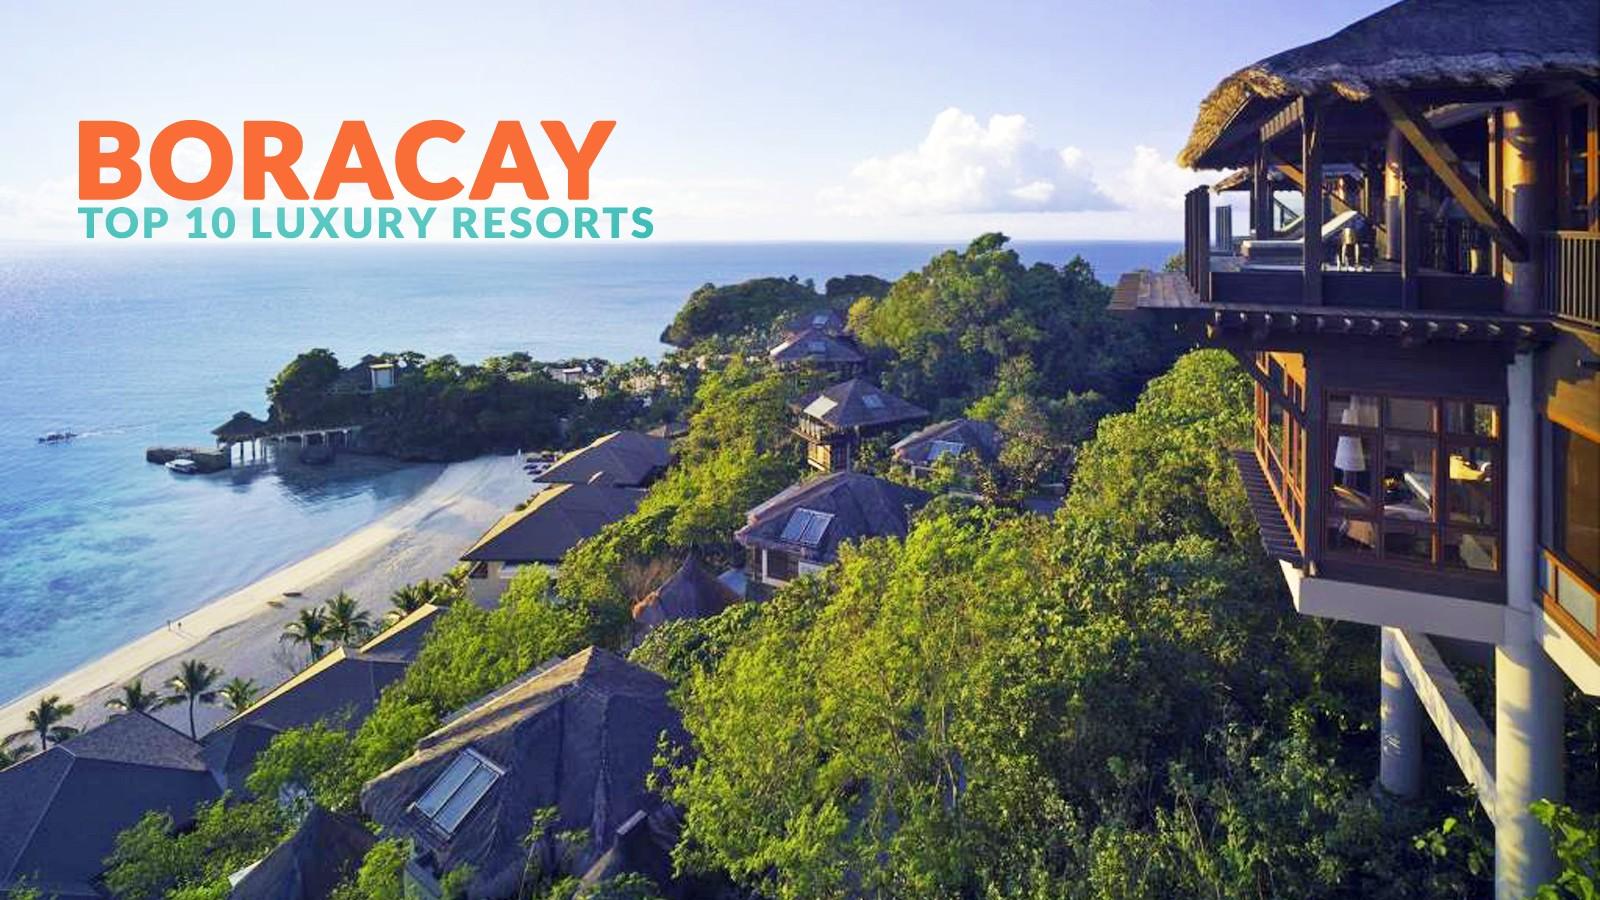 BORACAY: TOP 10 LUXURY RESORTS - Philippine Beach Guide